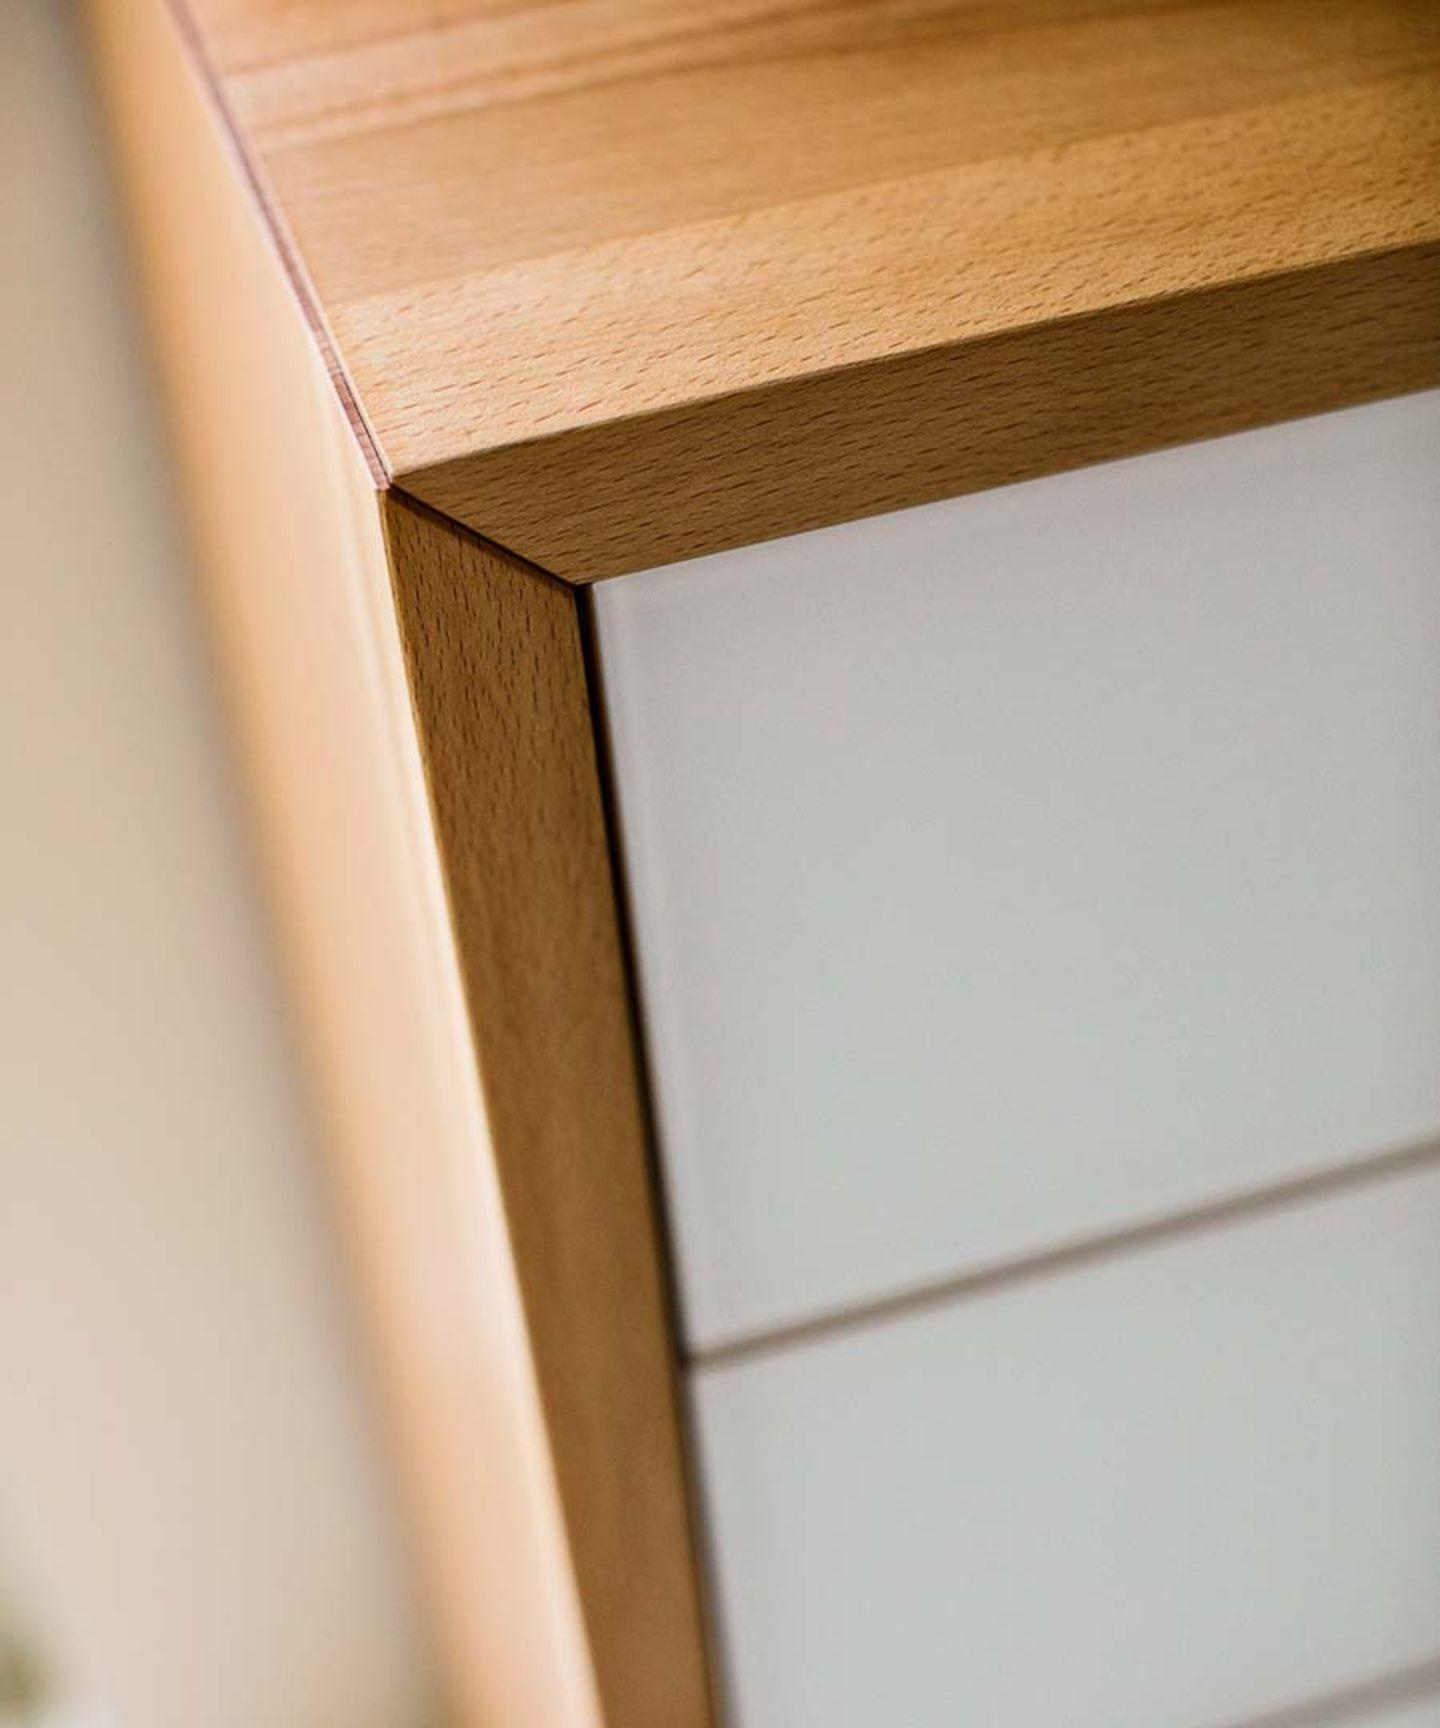 Massivholz Beimöbel Eckverbindung lunetto